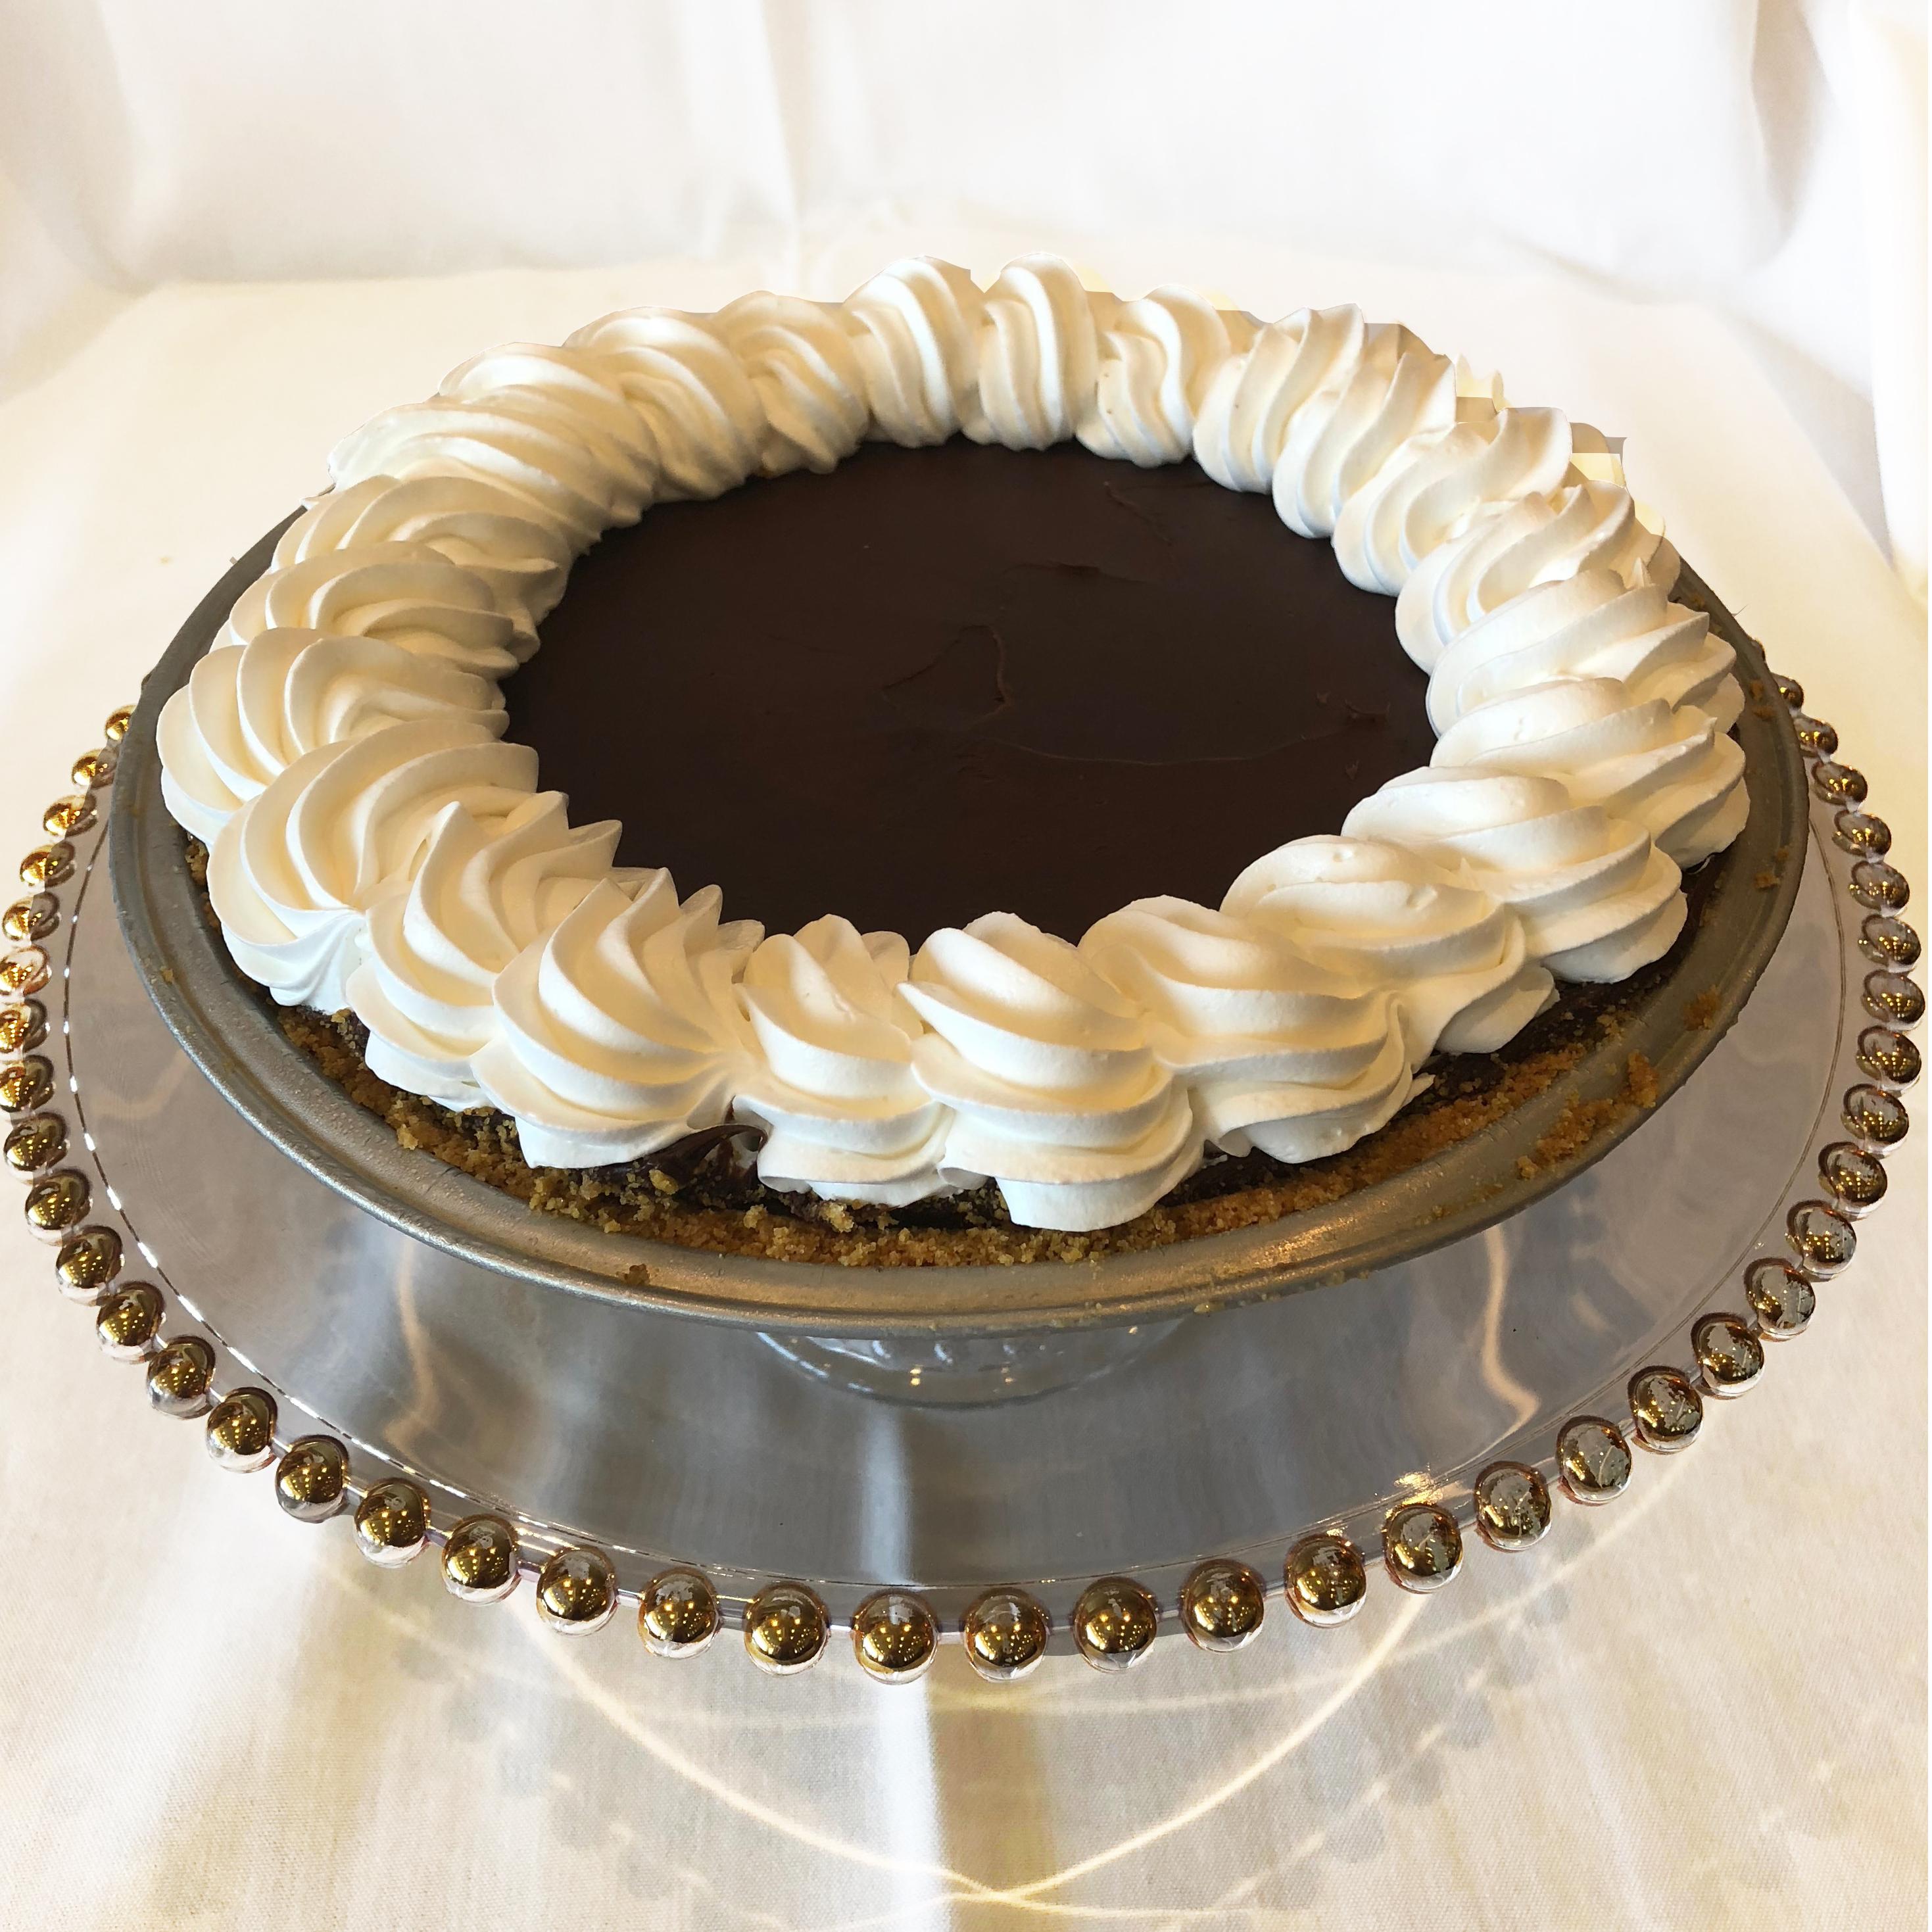 Whole Peanut Butter Pie Image